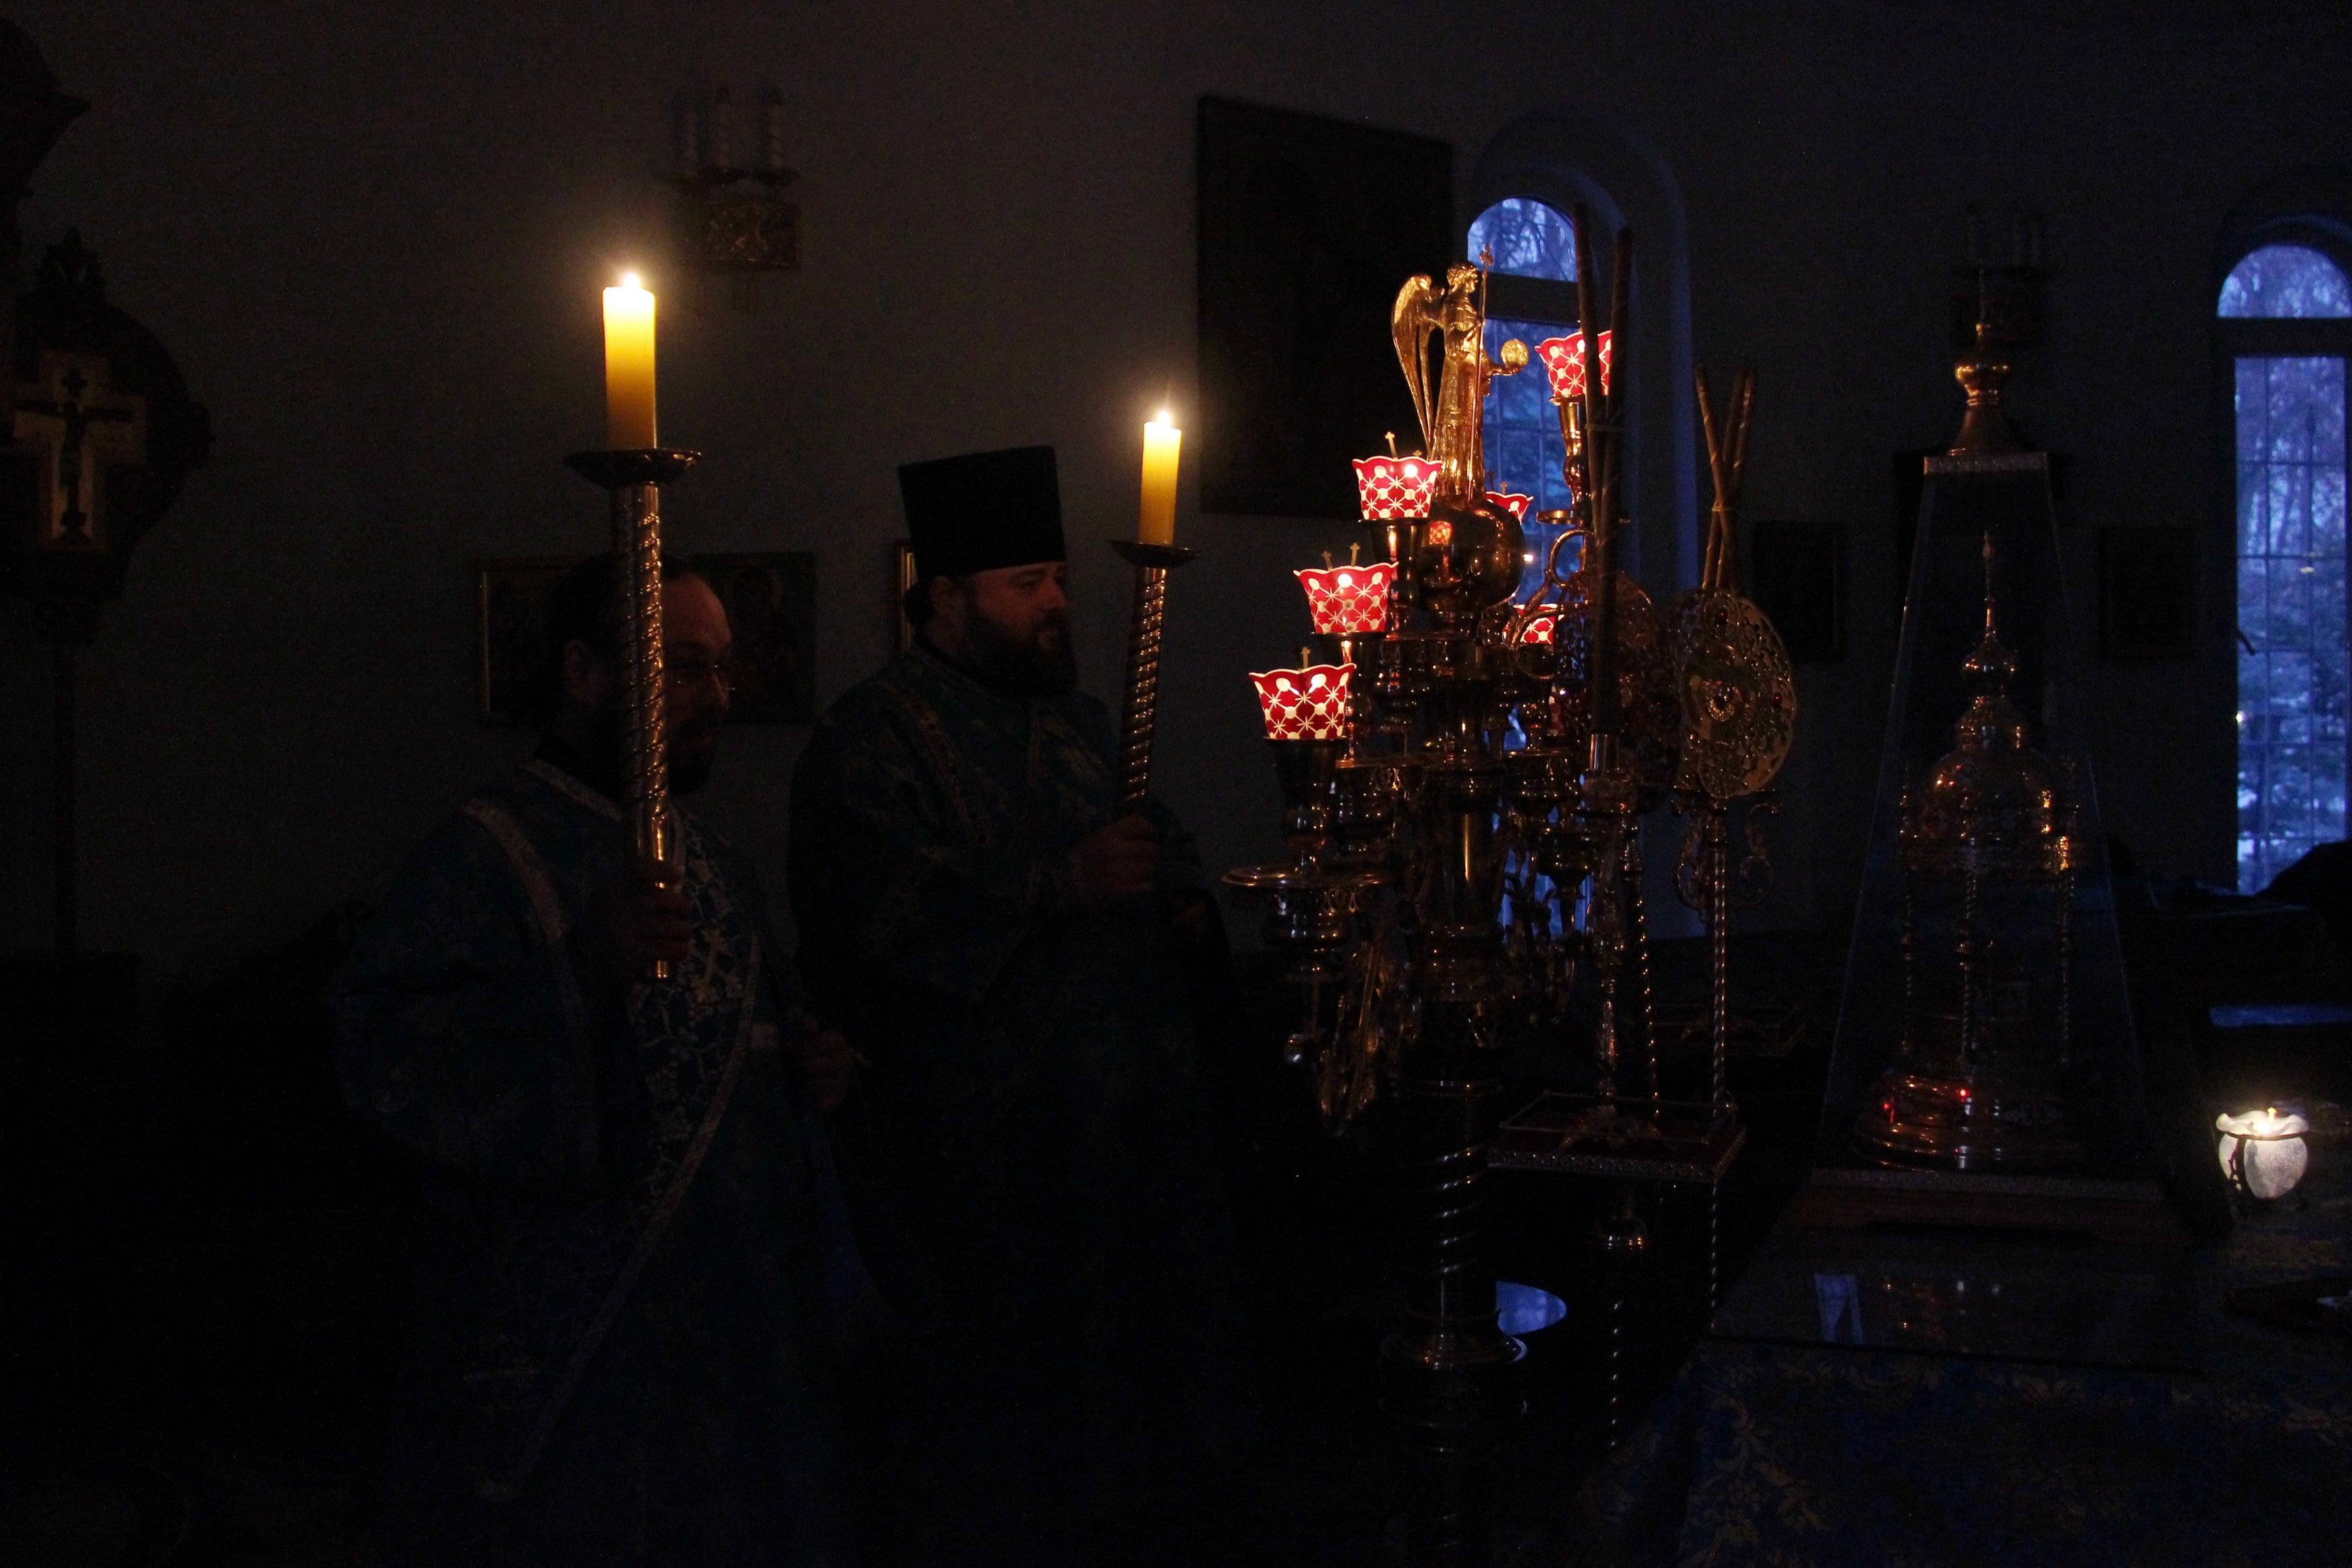 http://monuspen.ru/photoreports/2663d67533f8bbe794375b460e63e937.JPG